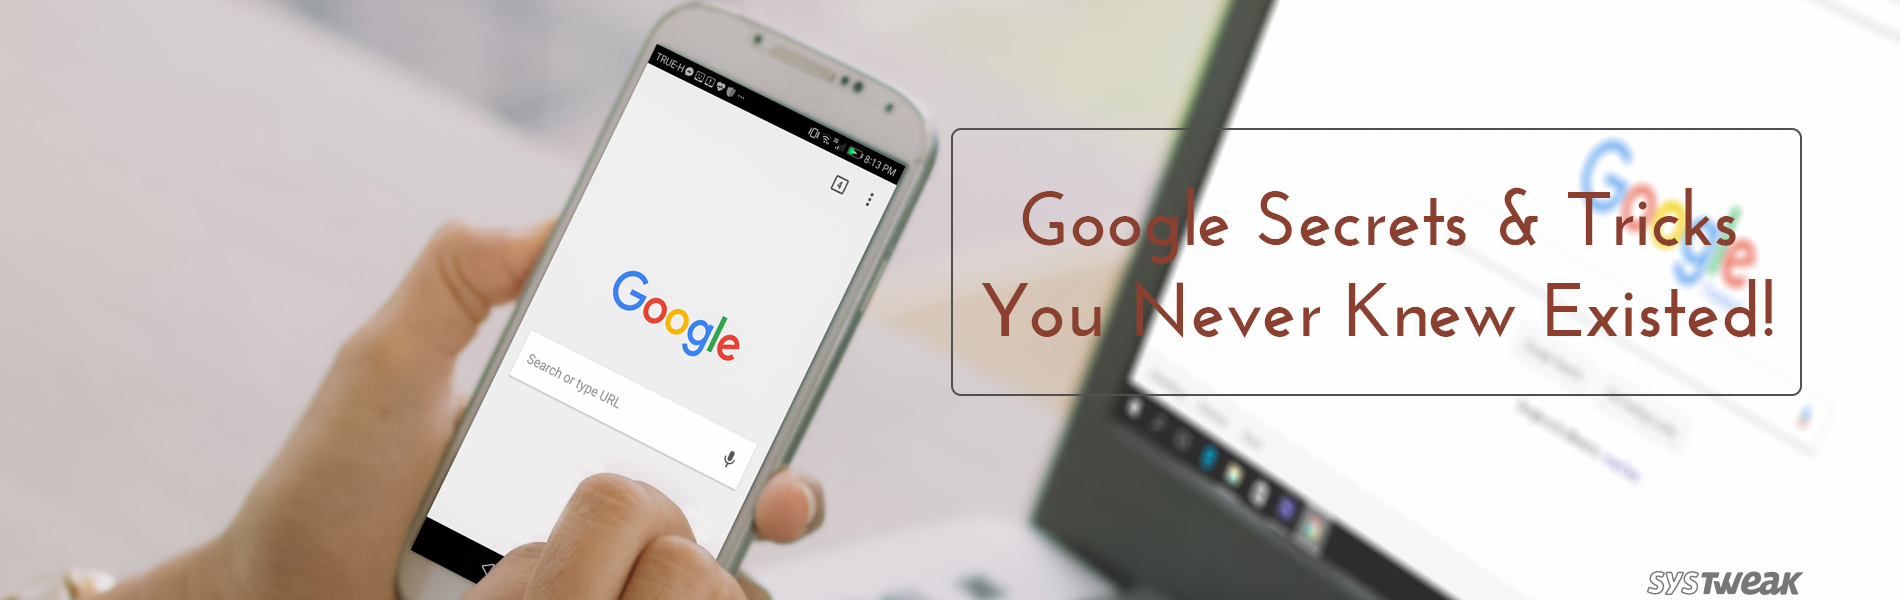 10 Best Google Tricks and Secrets